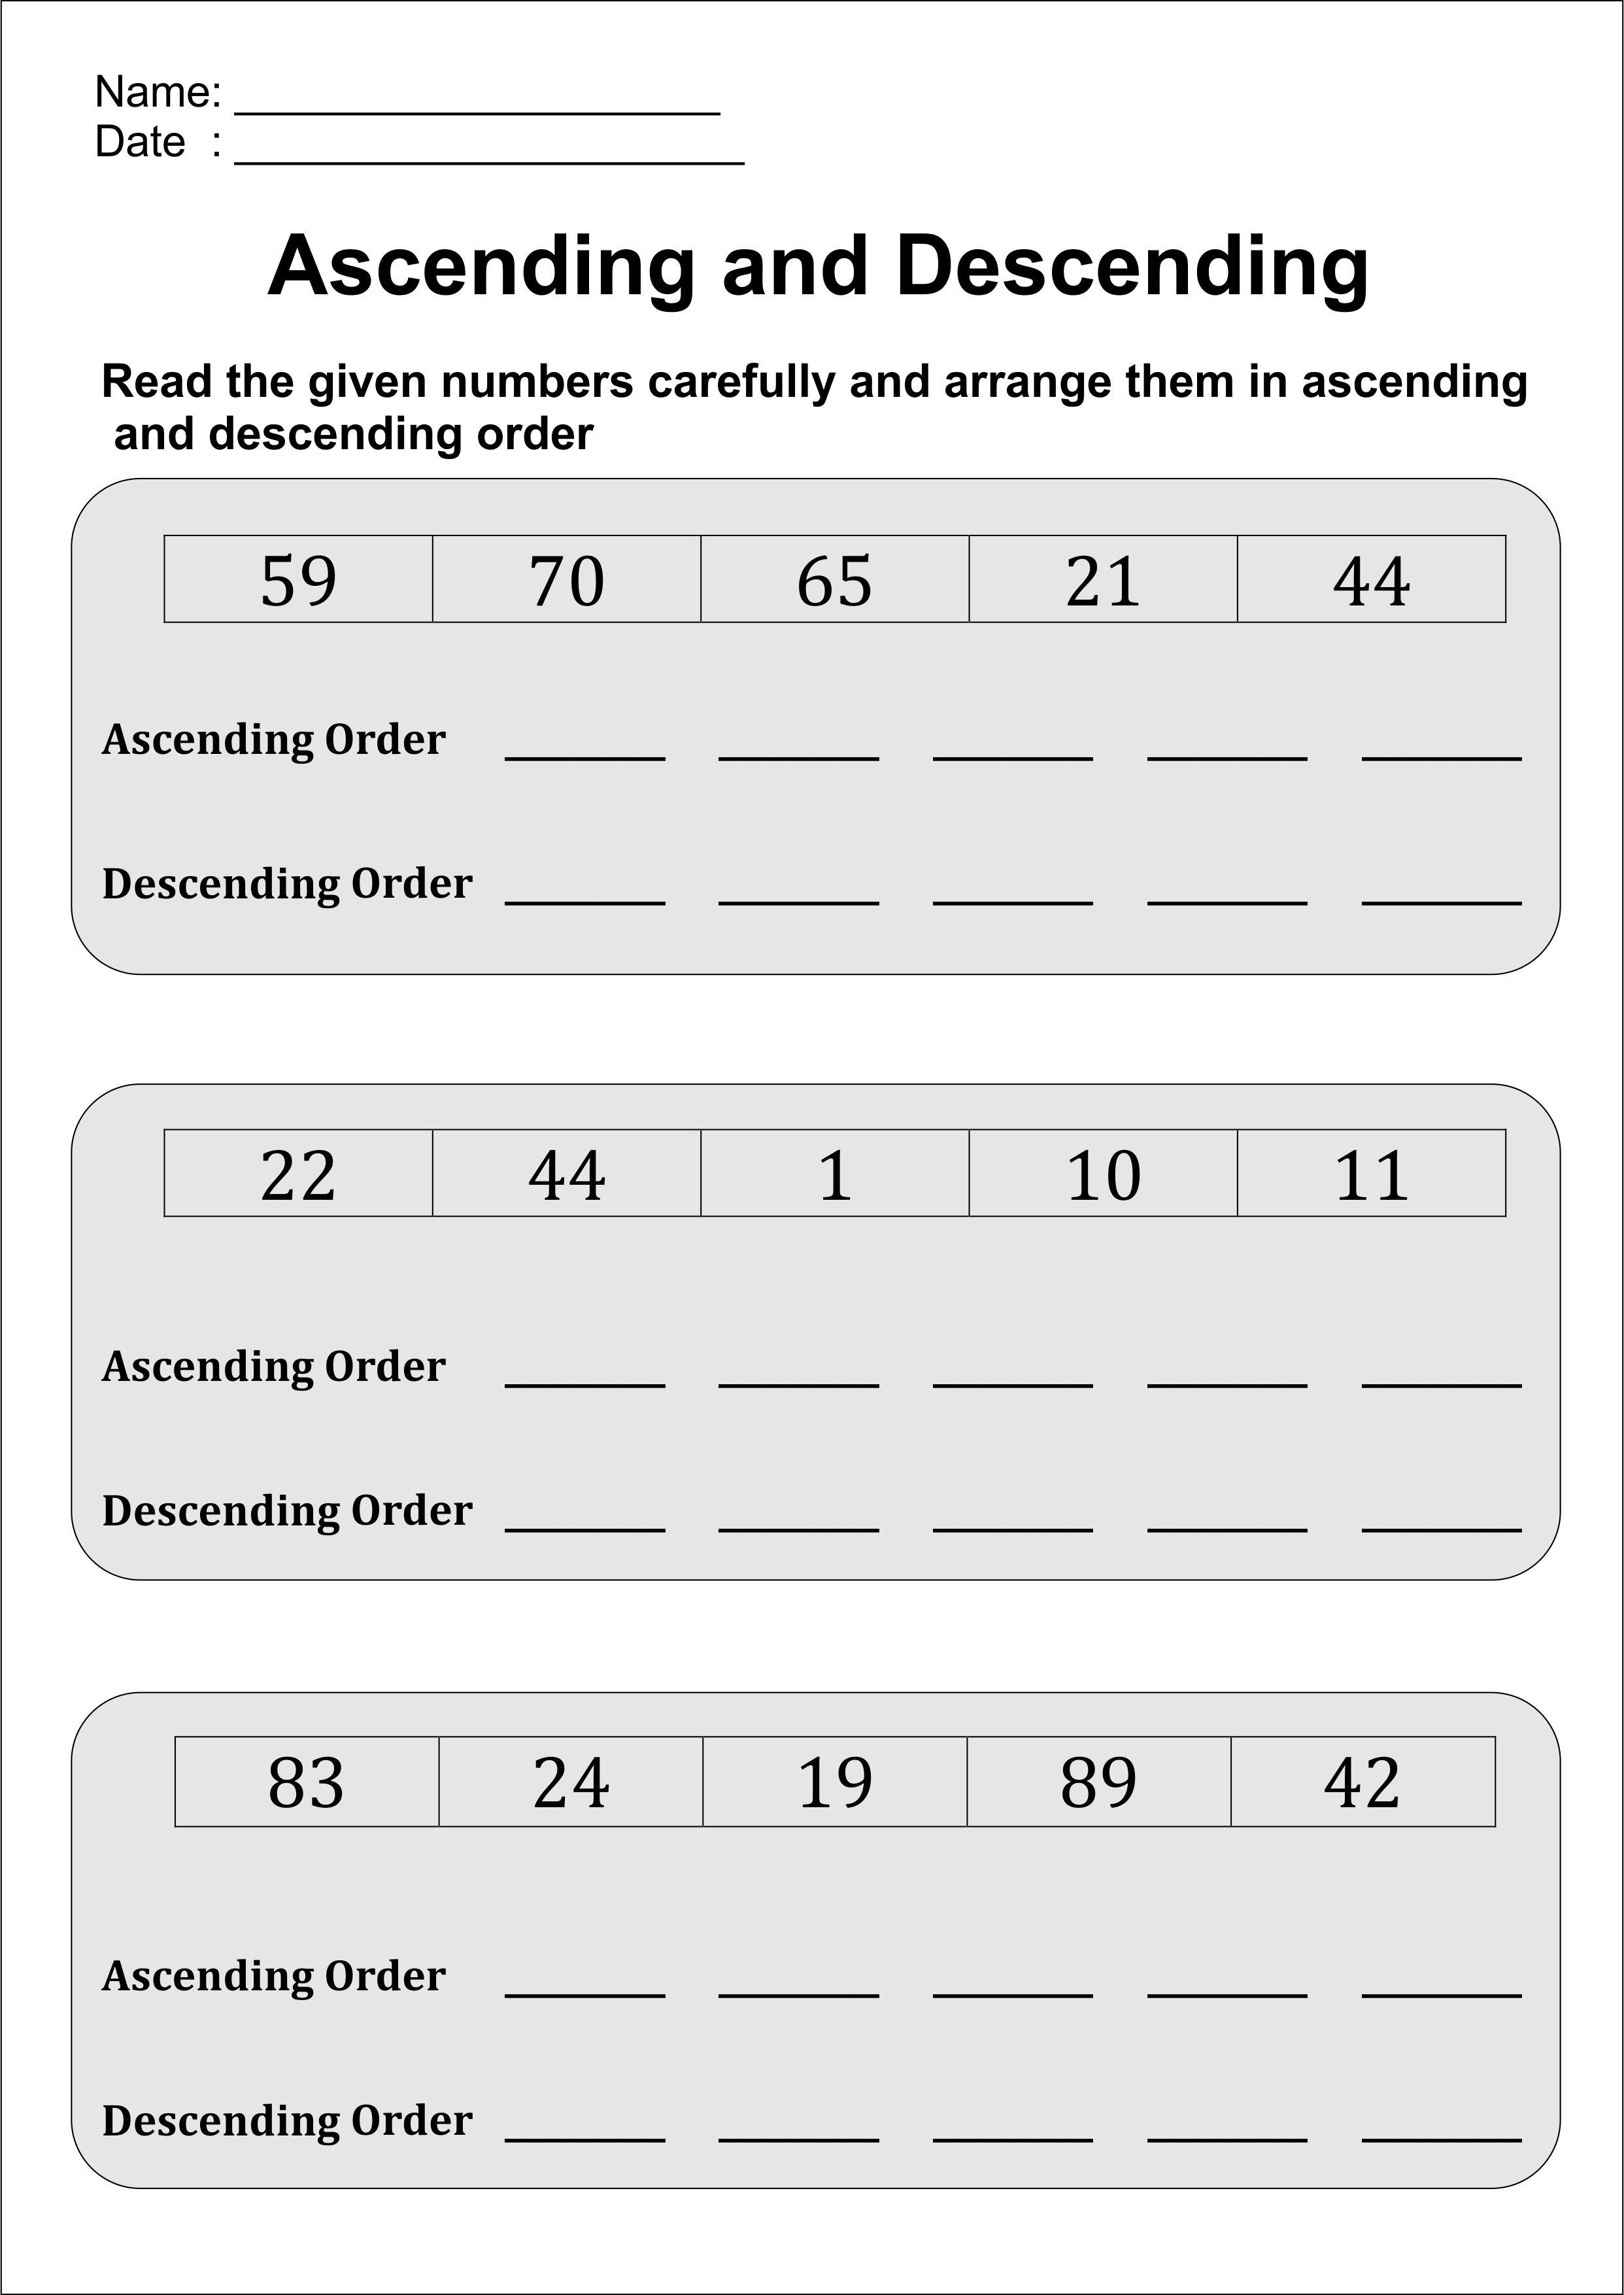 Arranging Numbers In Ascending And Descending Order